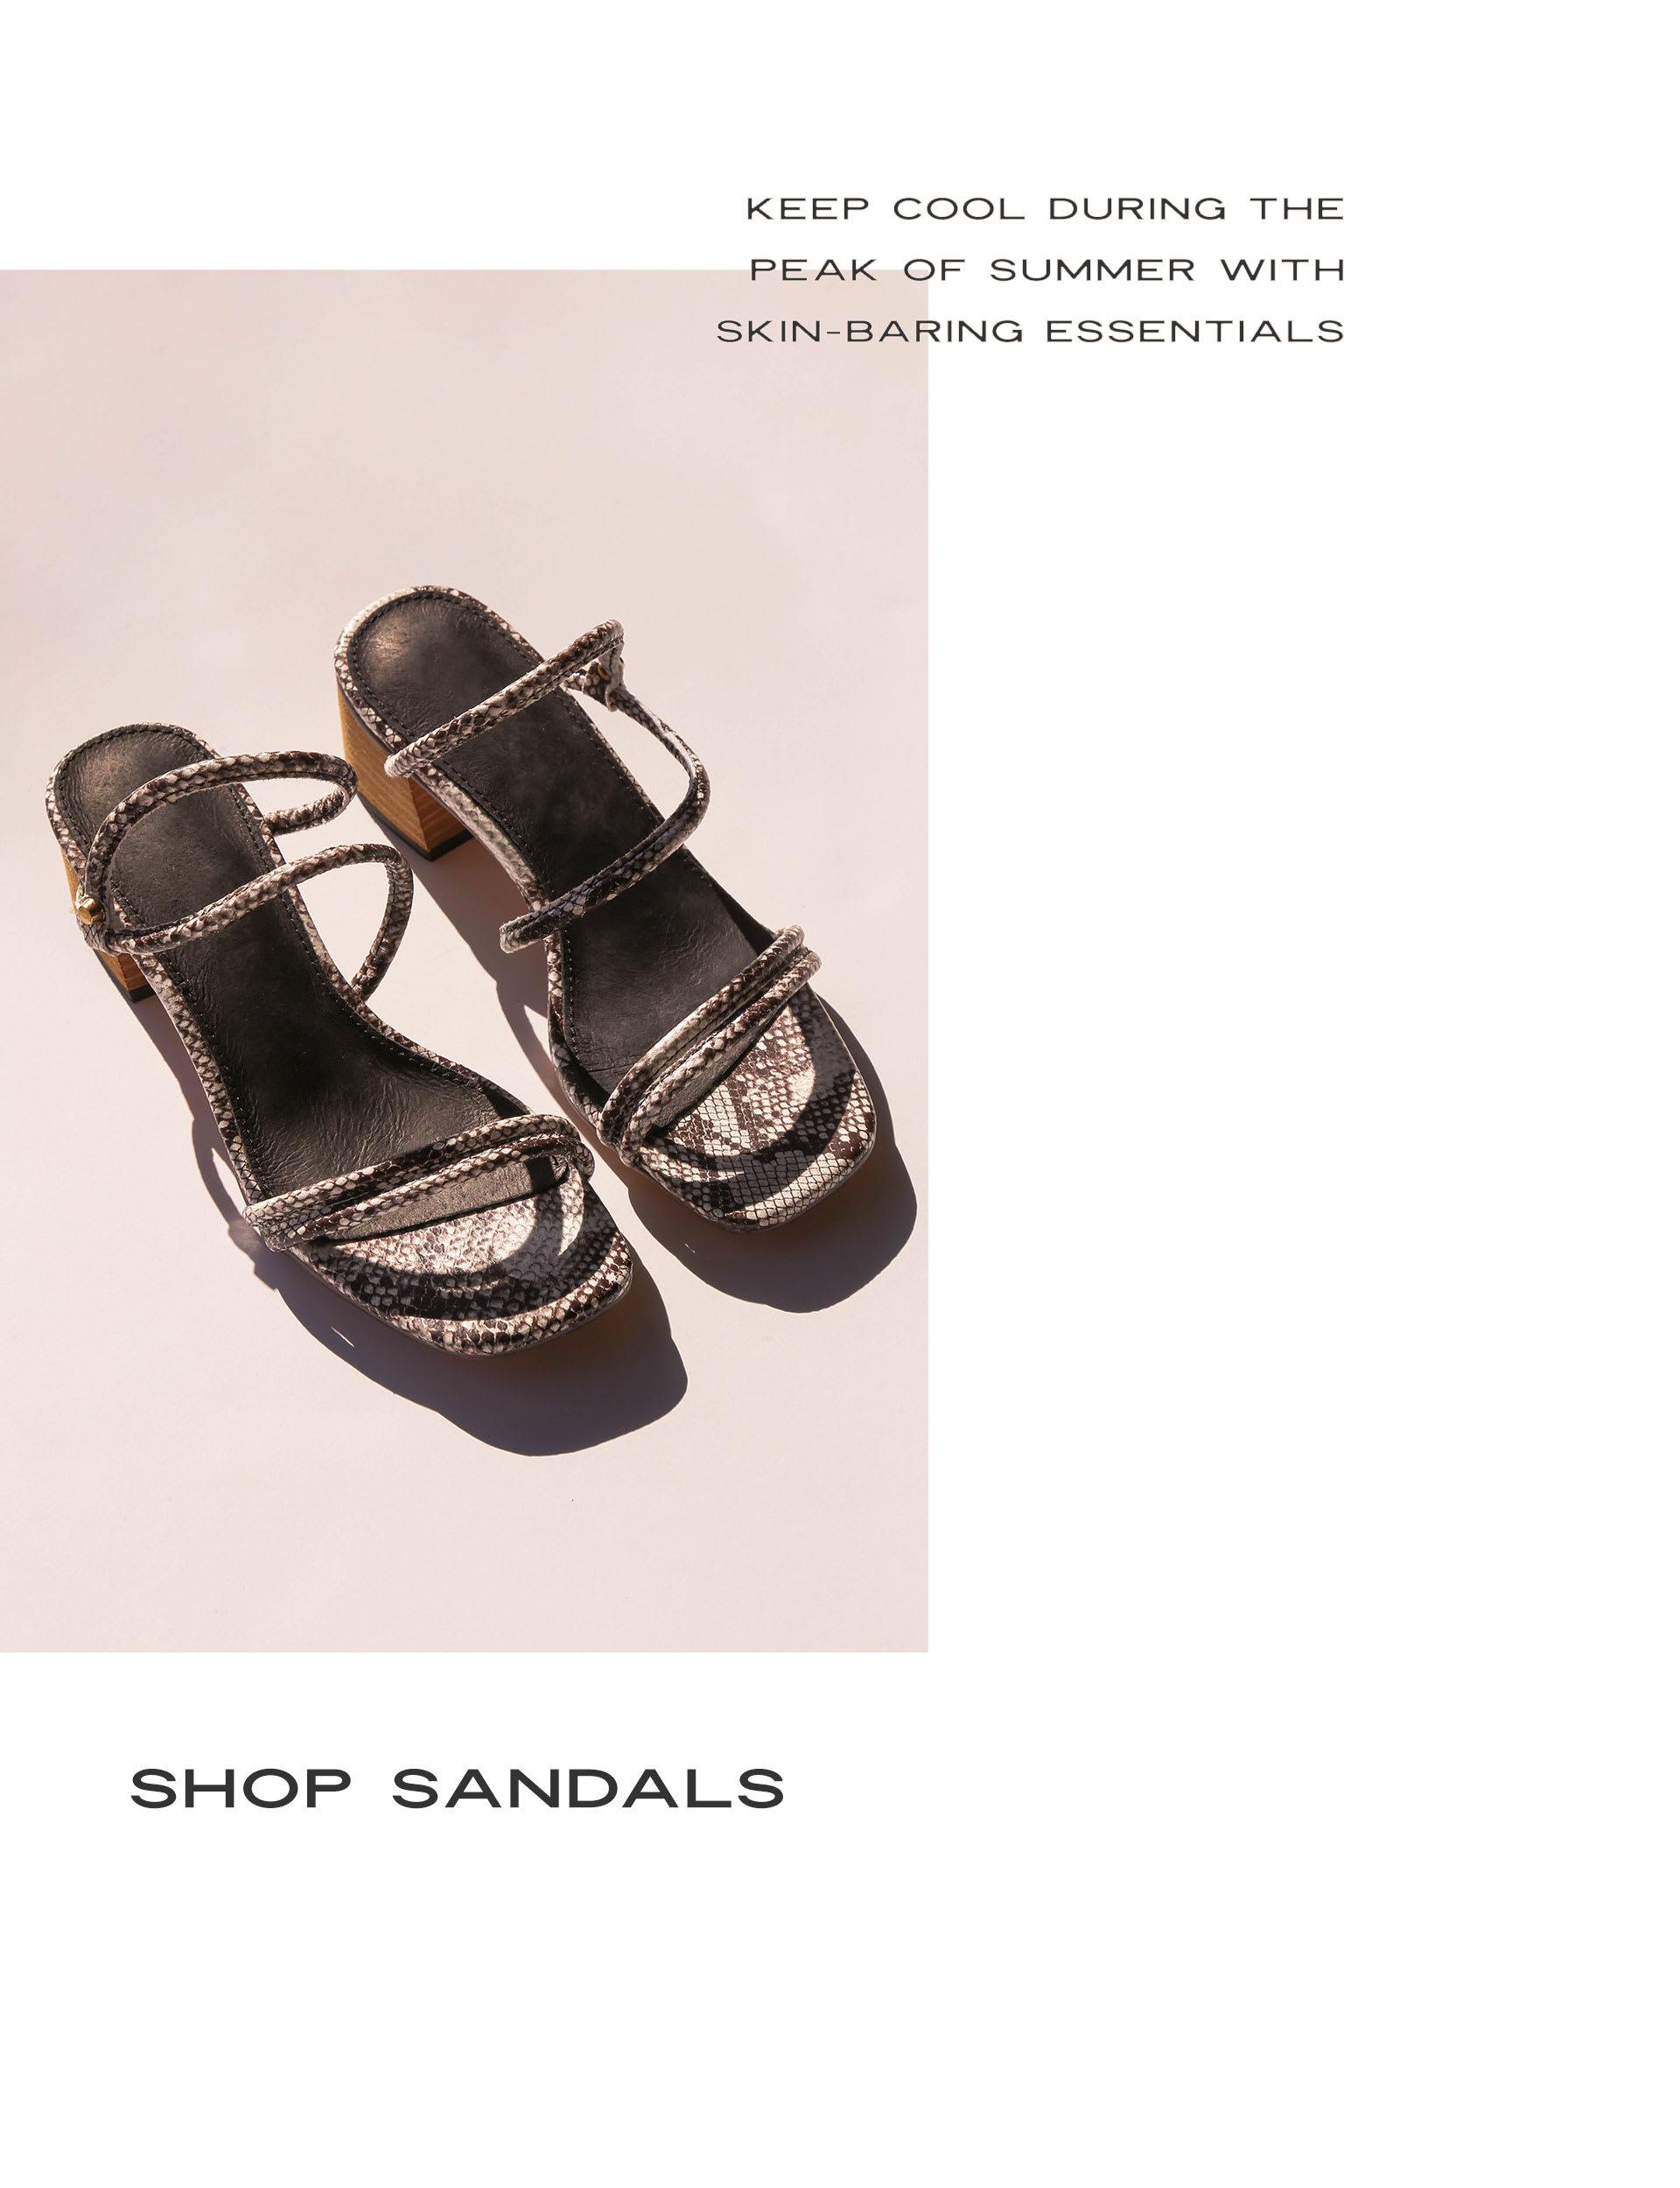 3b8605e09a8b ... leopard print handled clutch handbag black snake print heeled sandals